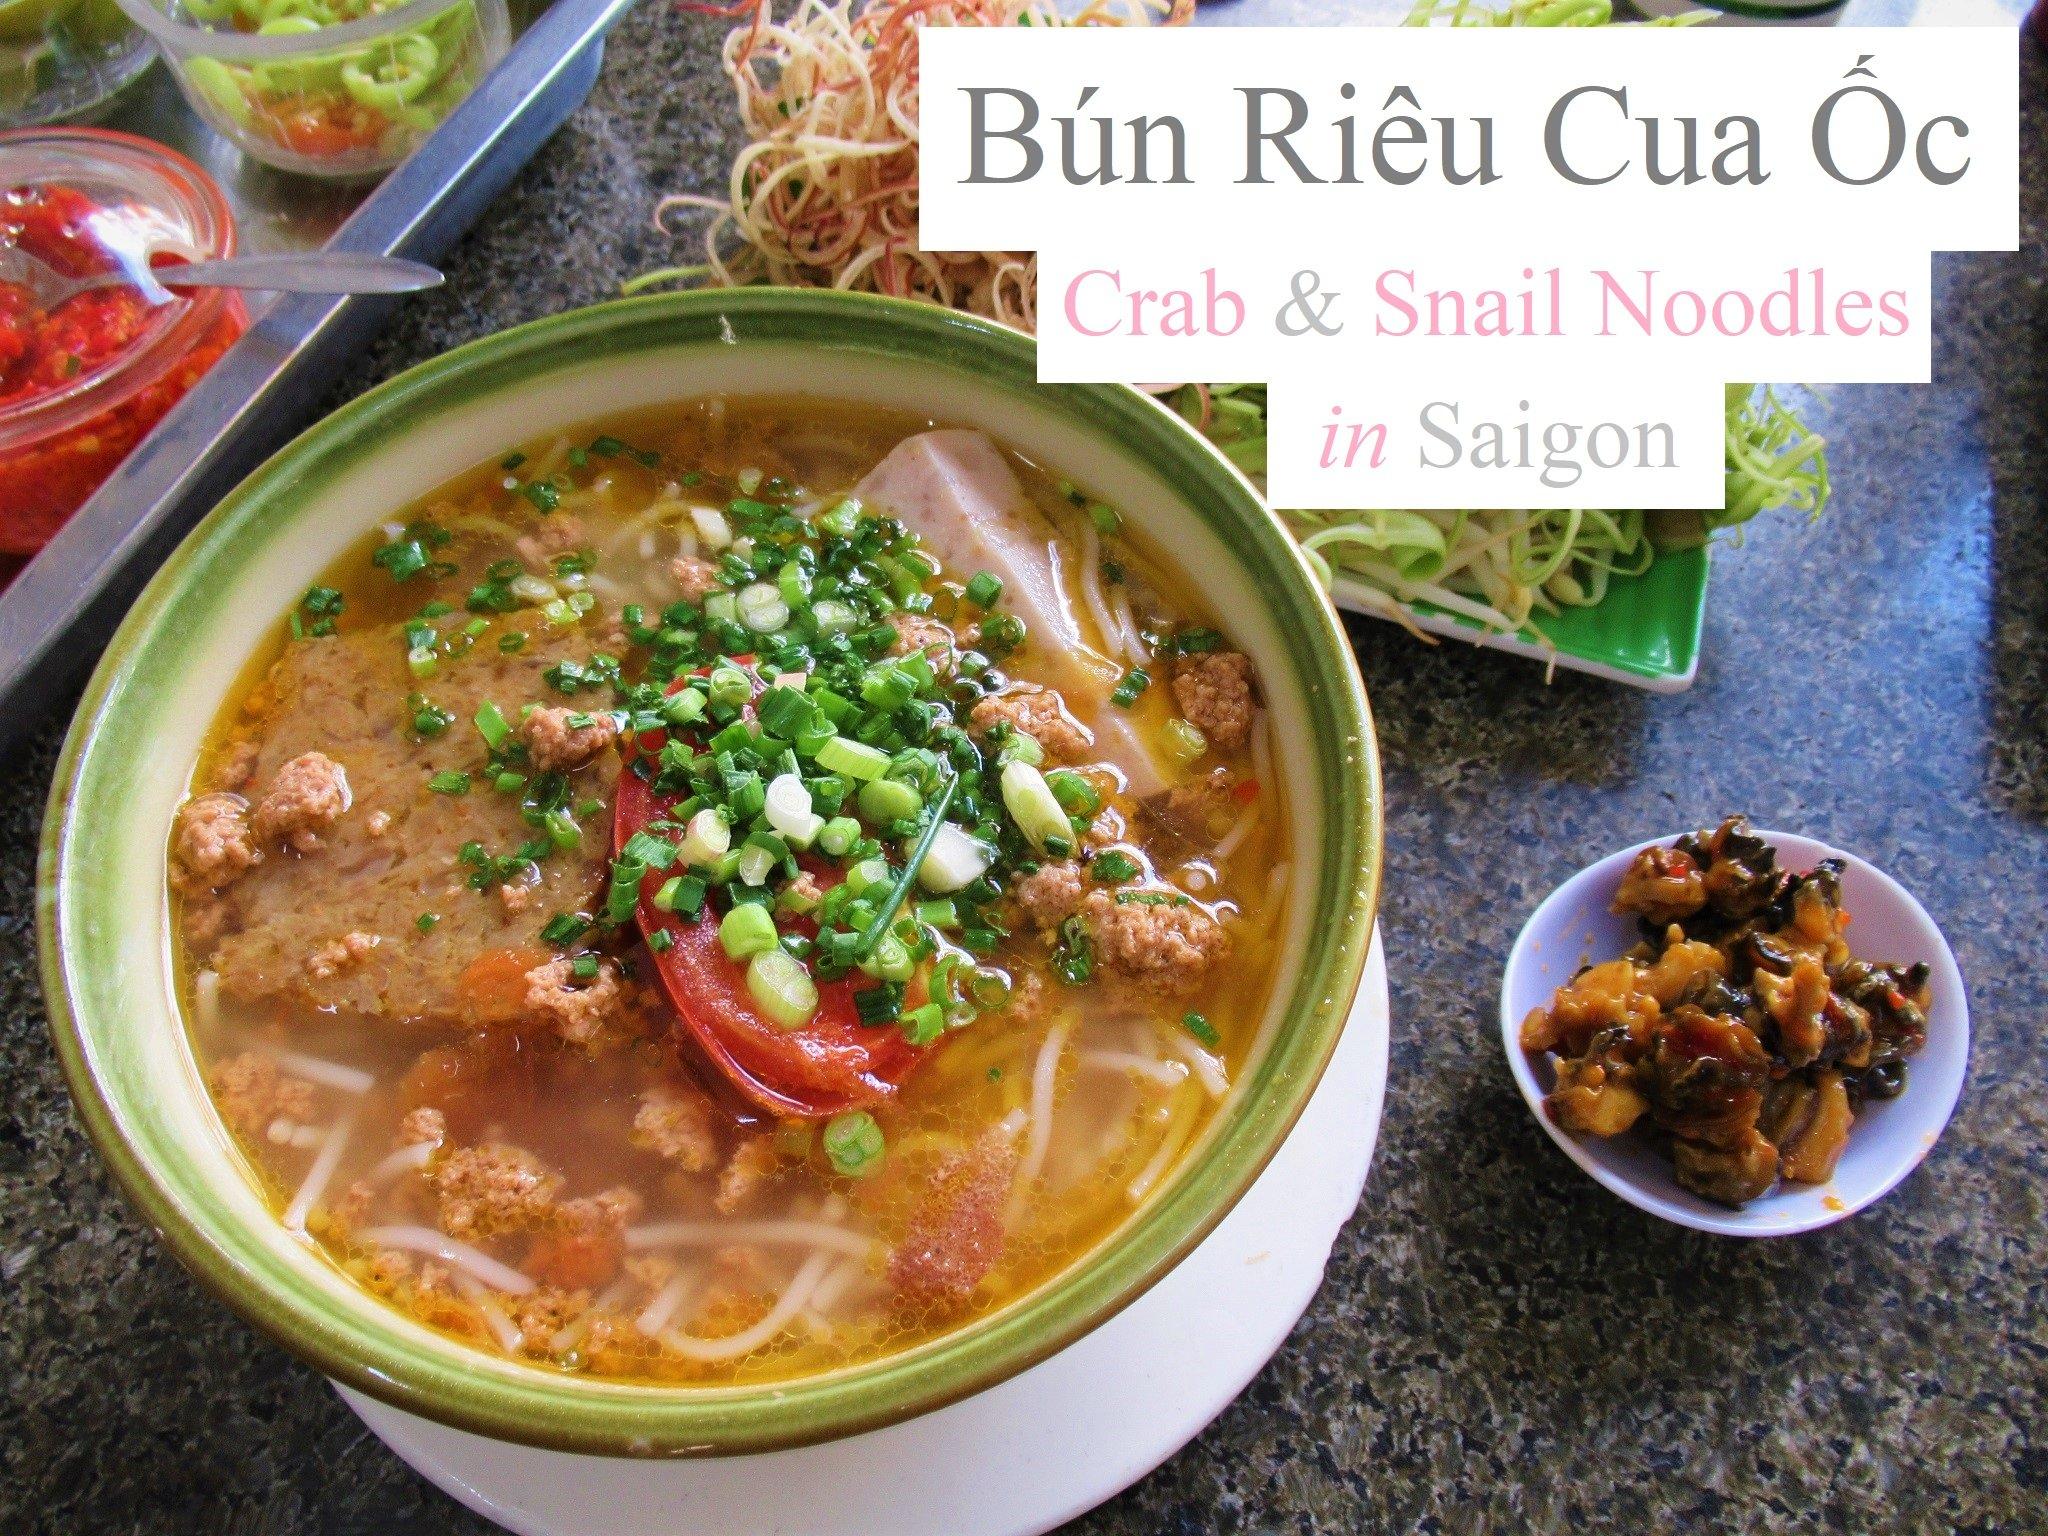 Bún Riêu Cua Ốc - crab & snail noodle soup, Saigon, Ho Chi Minh City, Vietnam